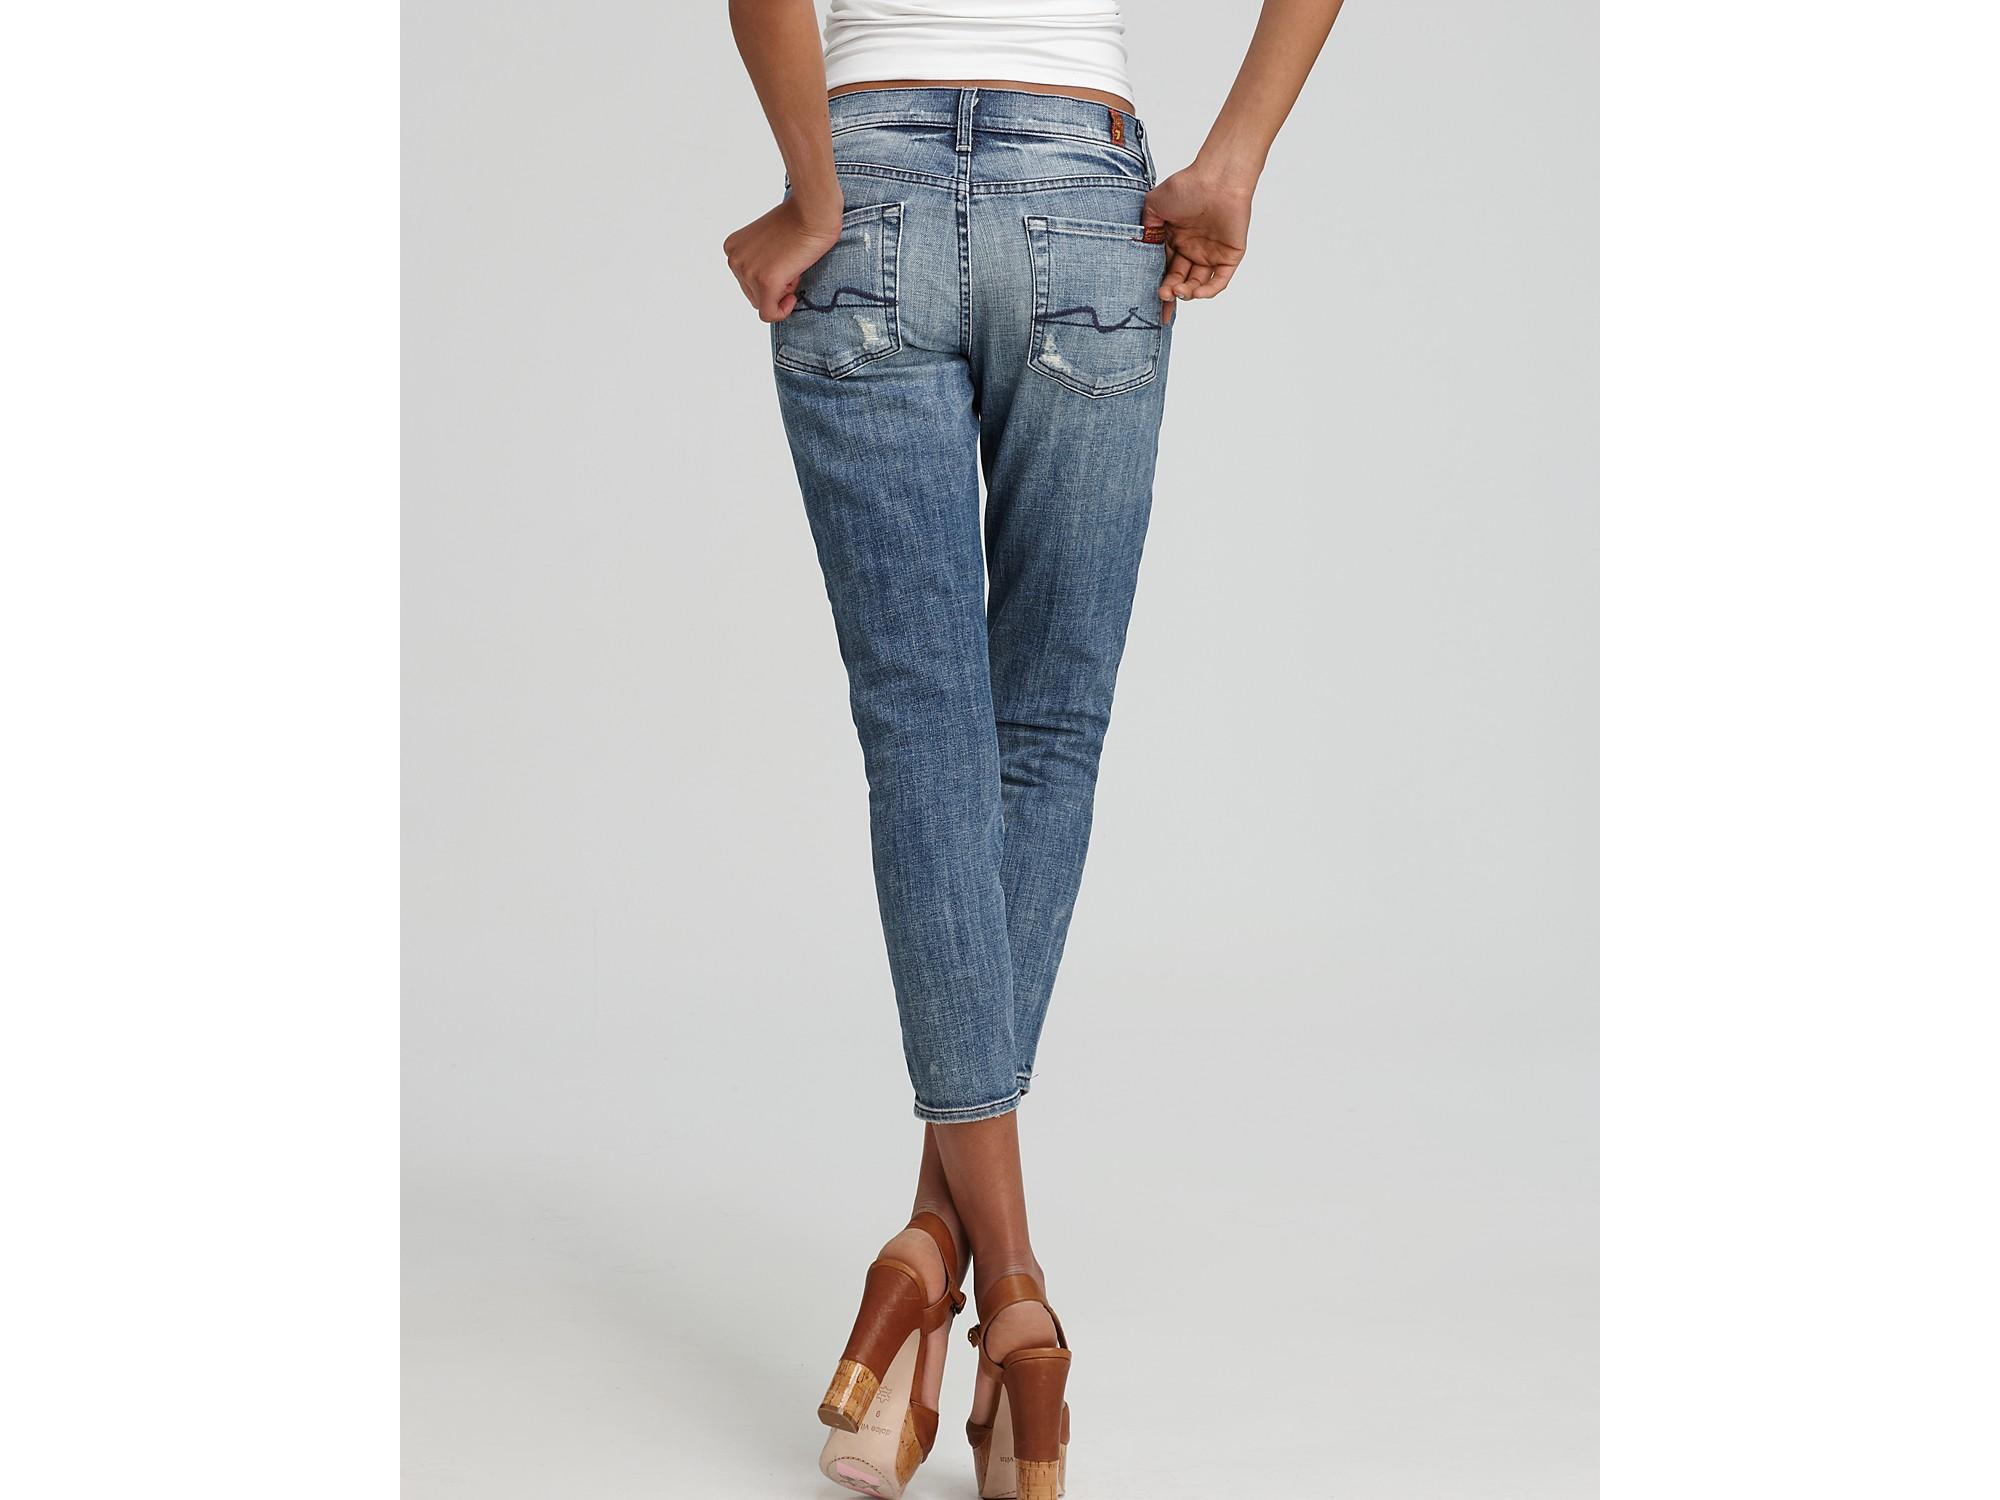 ash 7 for all mankind jeans roxanne crop skinny jeans in. Black Bedroom Furniture Sets. Home Design Ideas